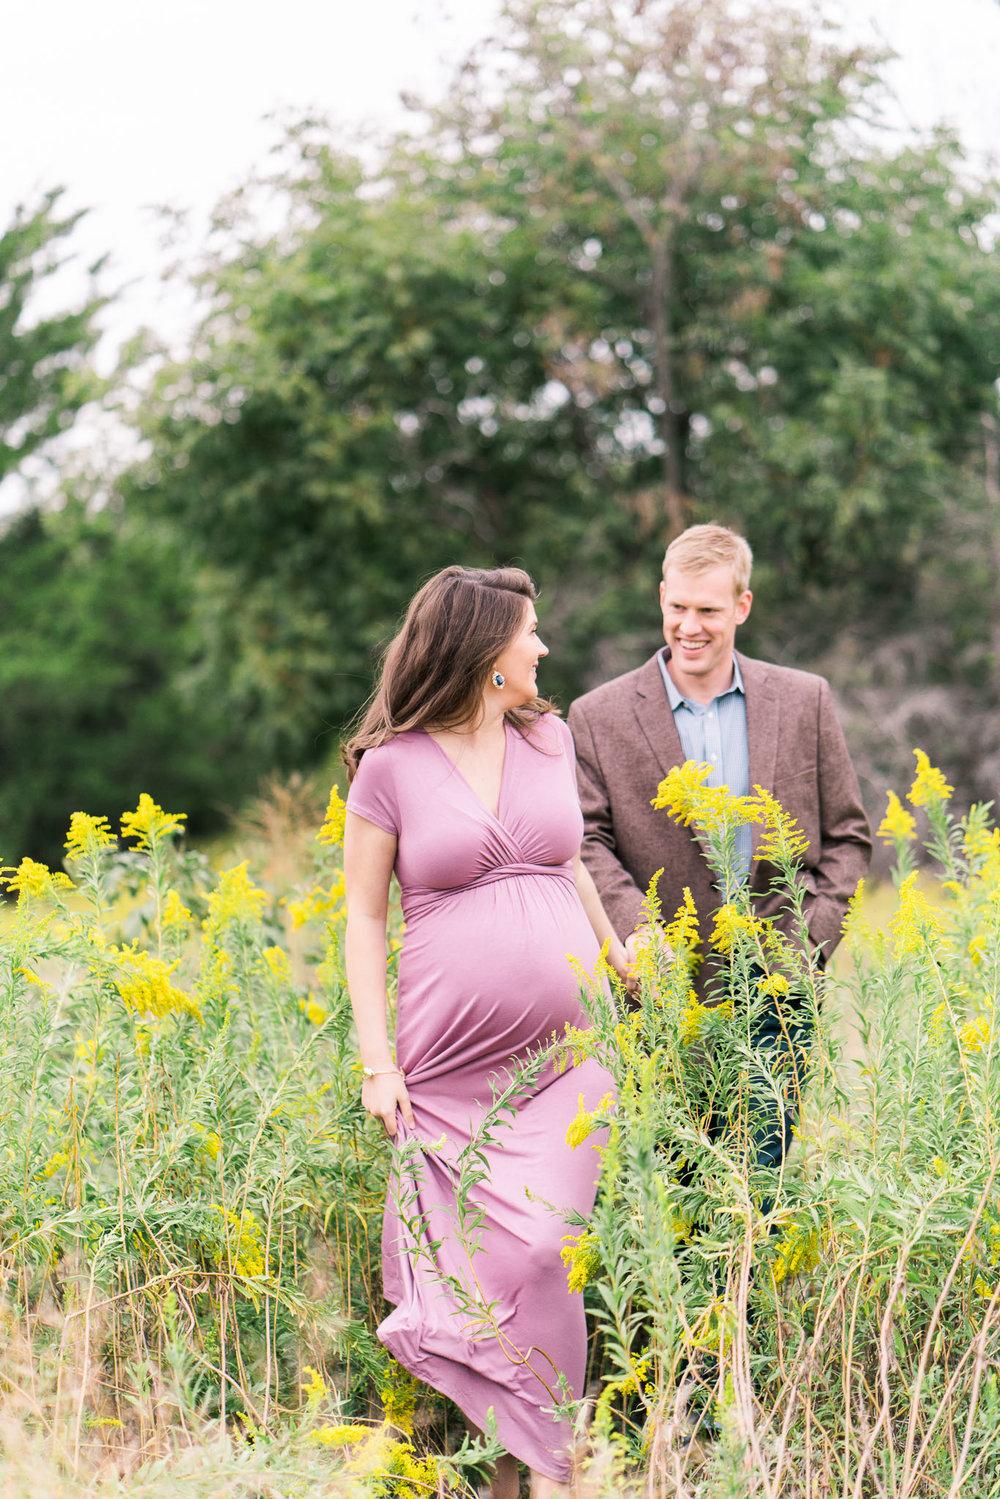 Lizanne-Andrew-Maternity-Kate-Bernard-Photography-Web-80.jpg